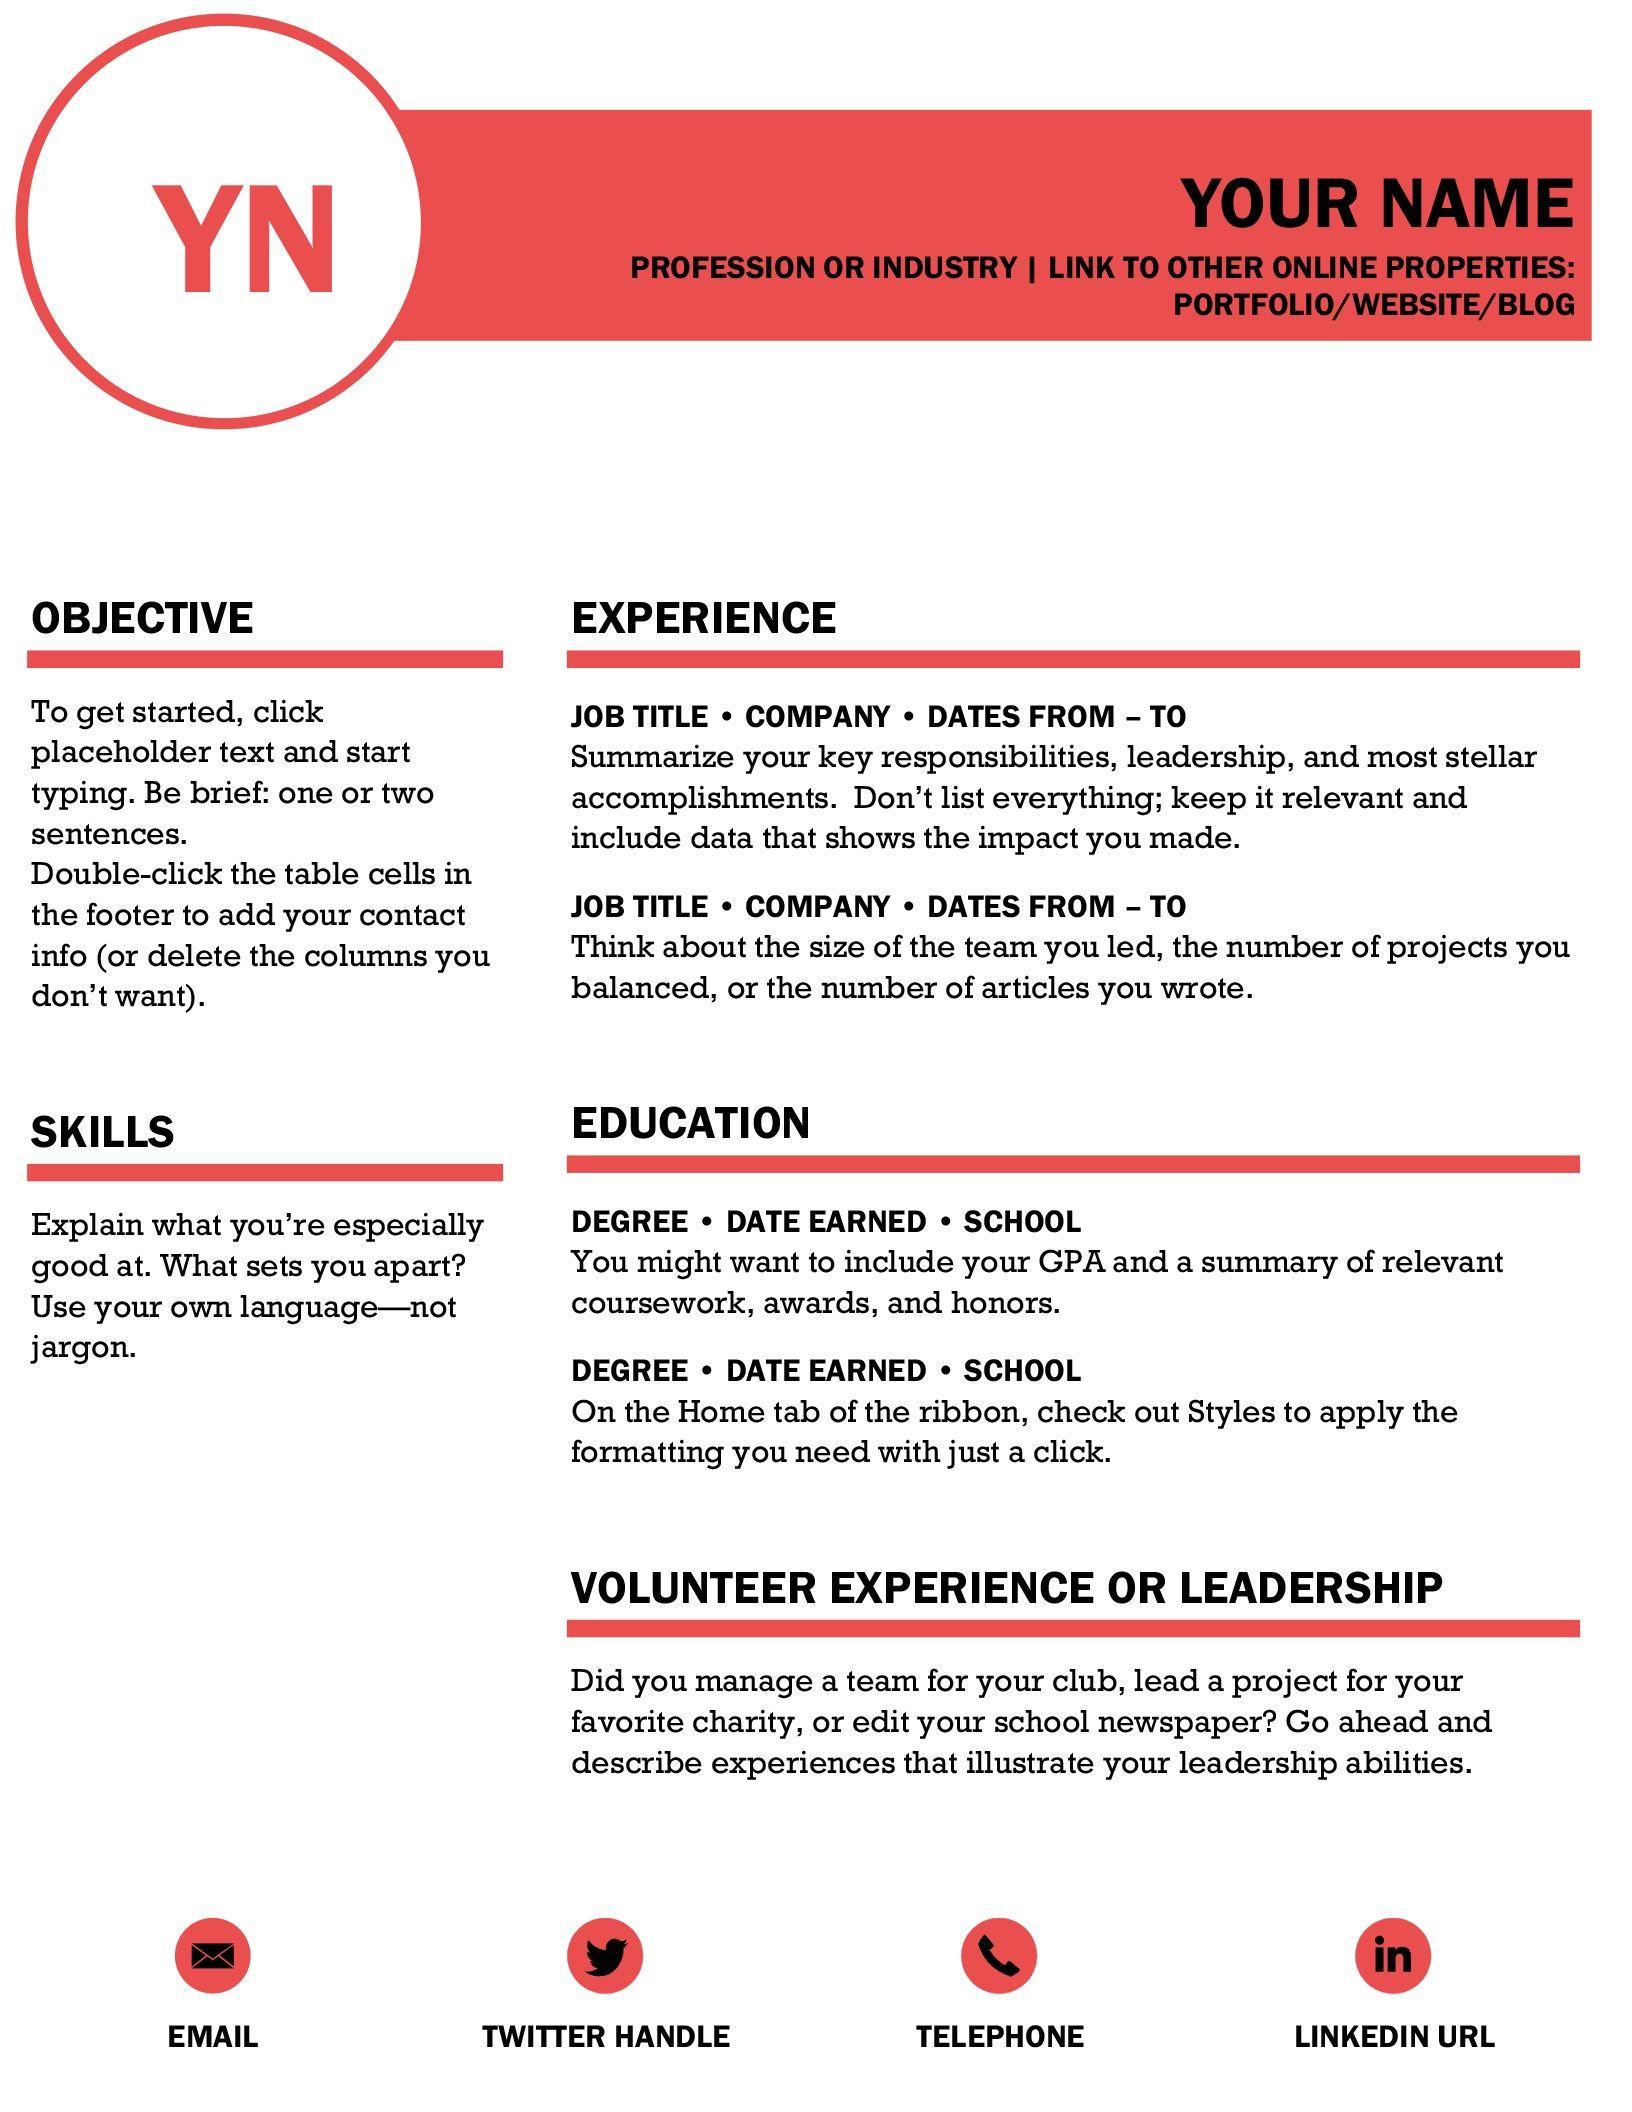 Polished Resume Designed By Moo Microsoft Word Resume Template Resume Design Template Resume Design